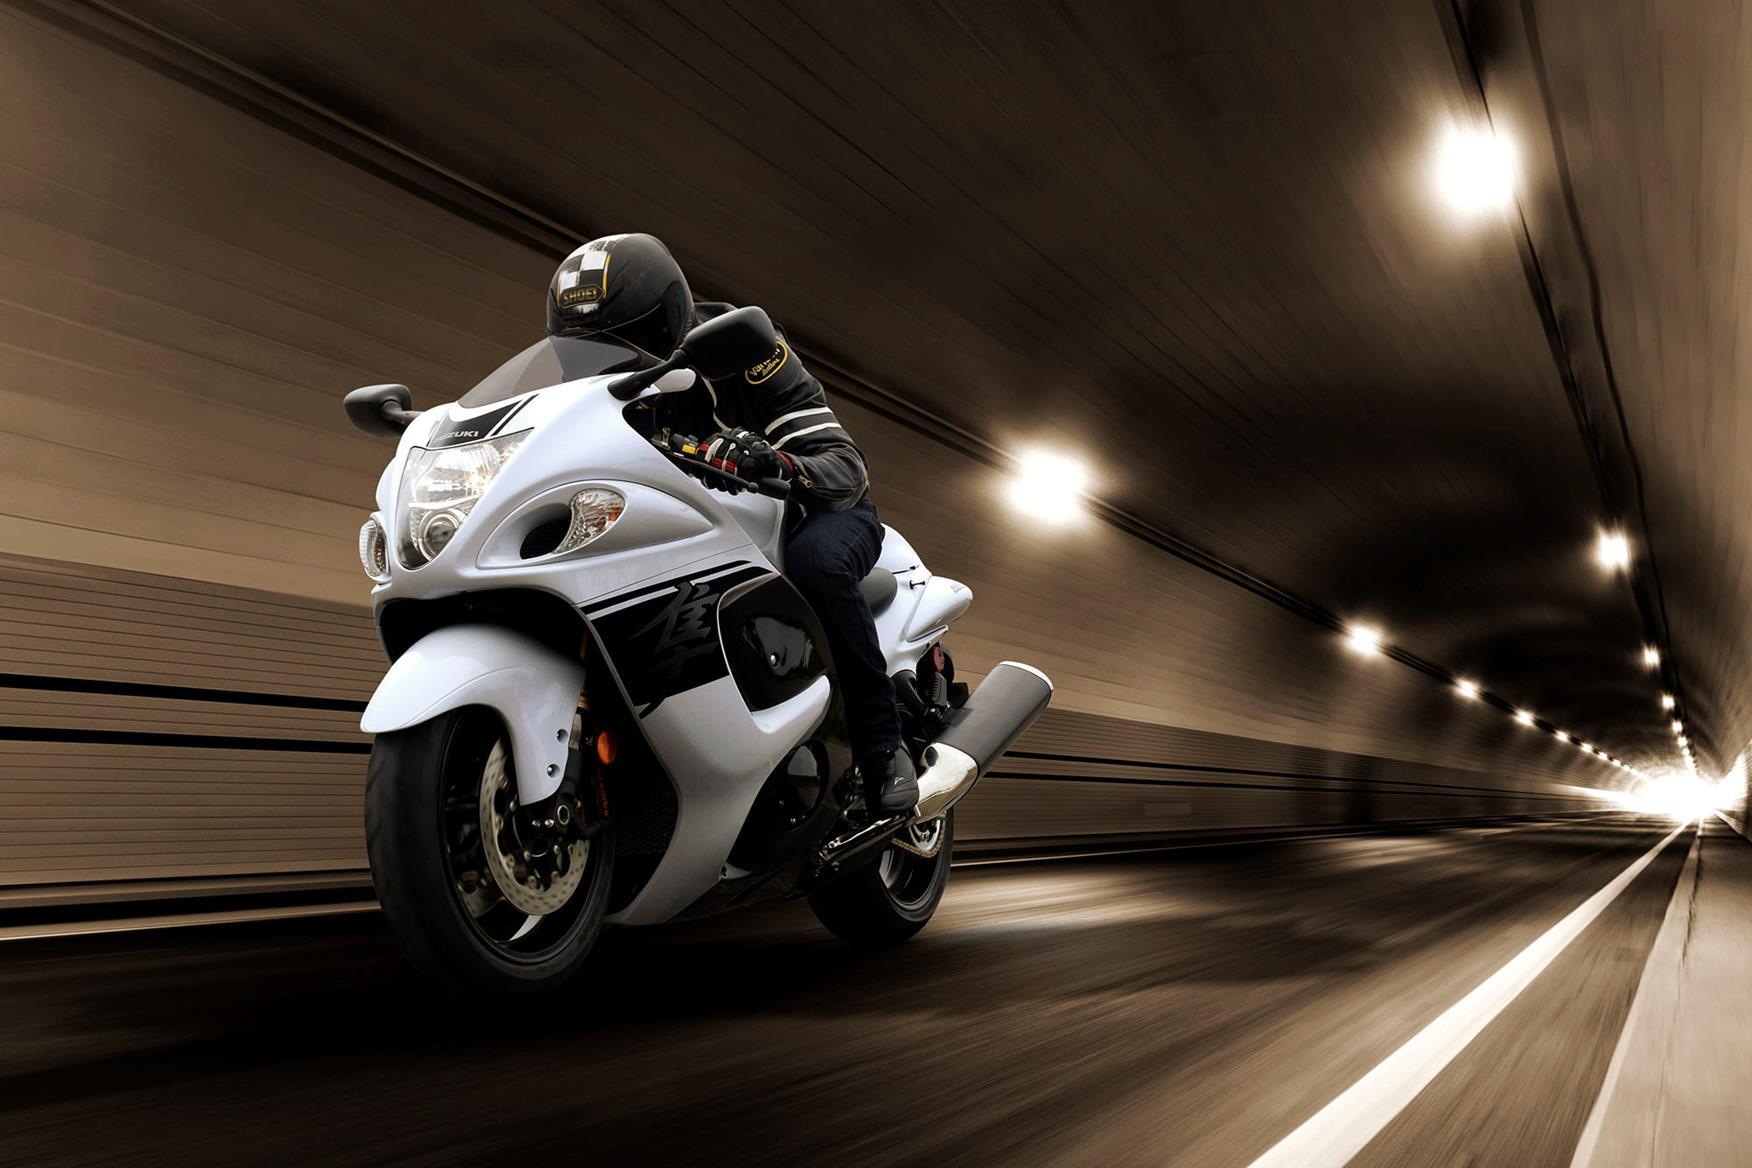 Suzuki Hayabusa on the road